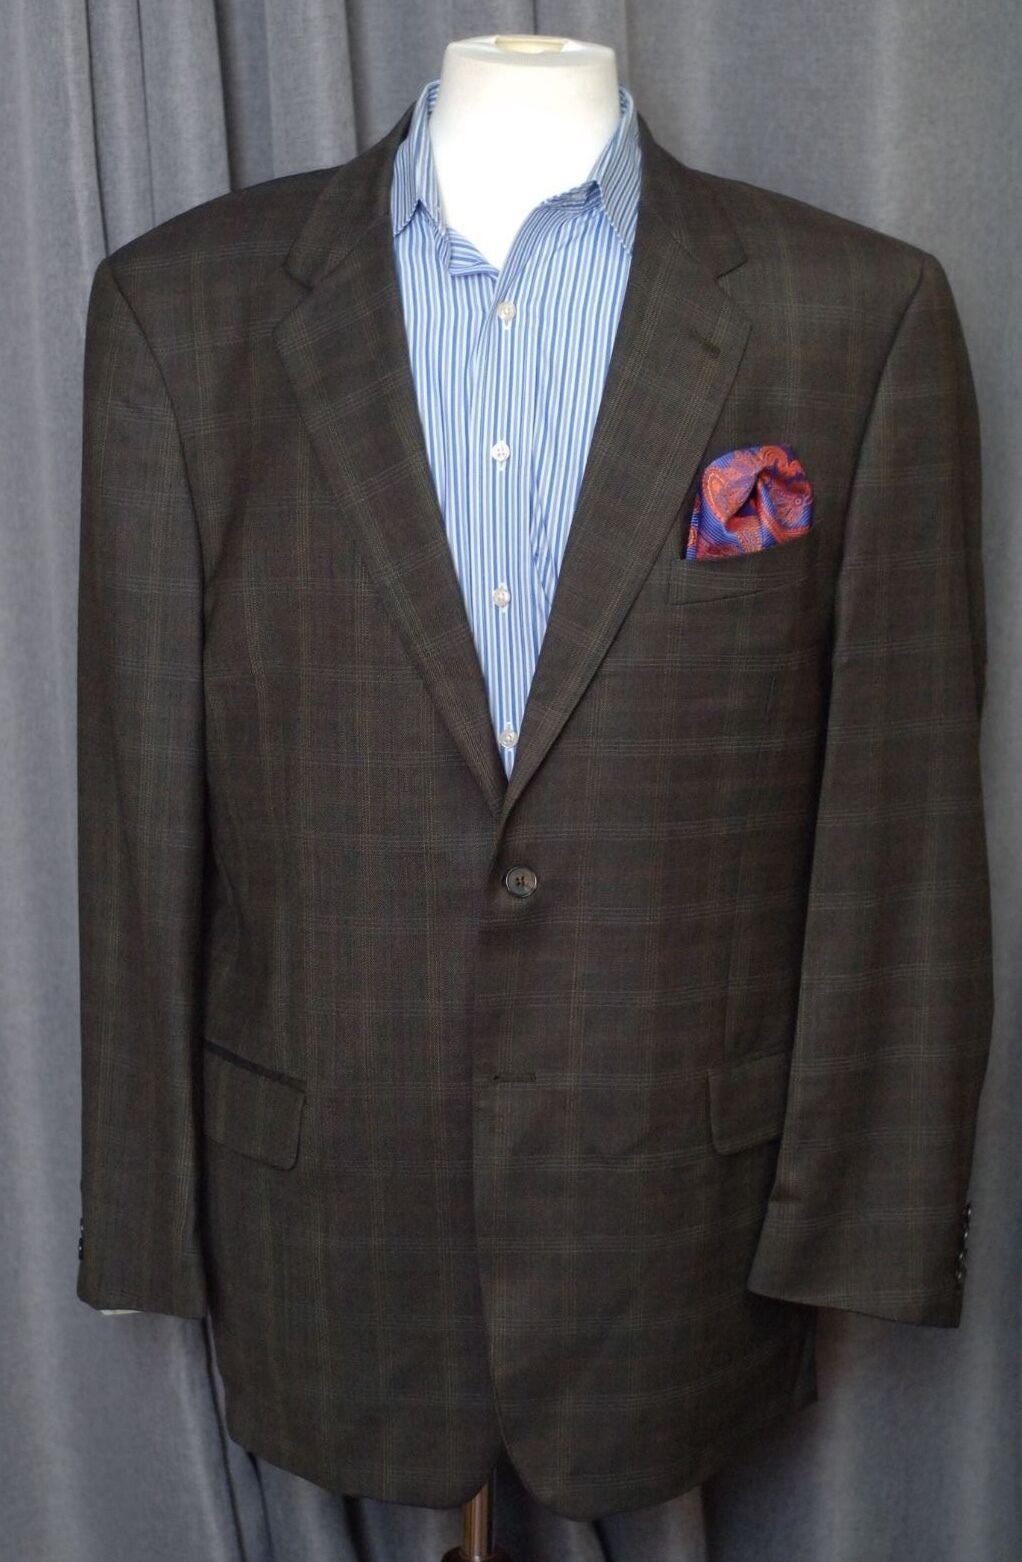 Joseph Abboud Herren Braun Grau Kariert, Wolle Sport Mantel Blazer 44l 44     | Sale Online Shop  | Komfort  | Moderne Technologie